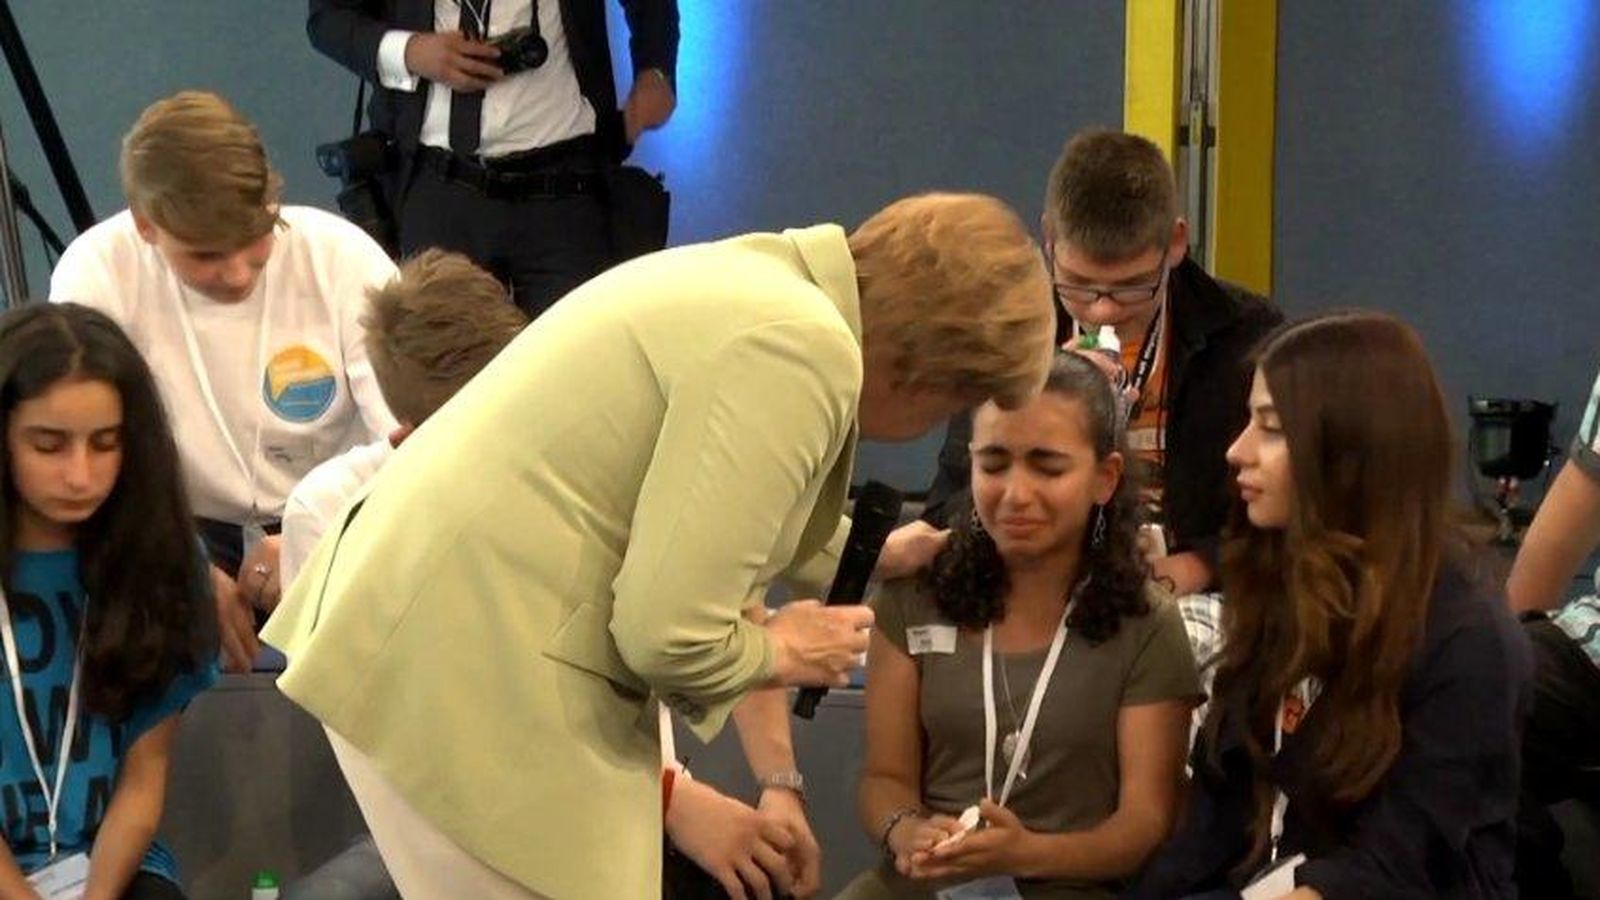 Foto: Angela Merkel intenta animar a una desconsolada niña (NDR/Aktuell)